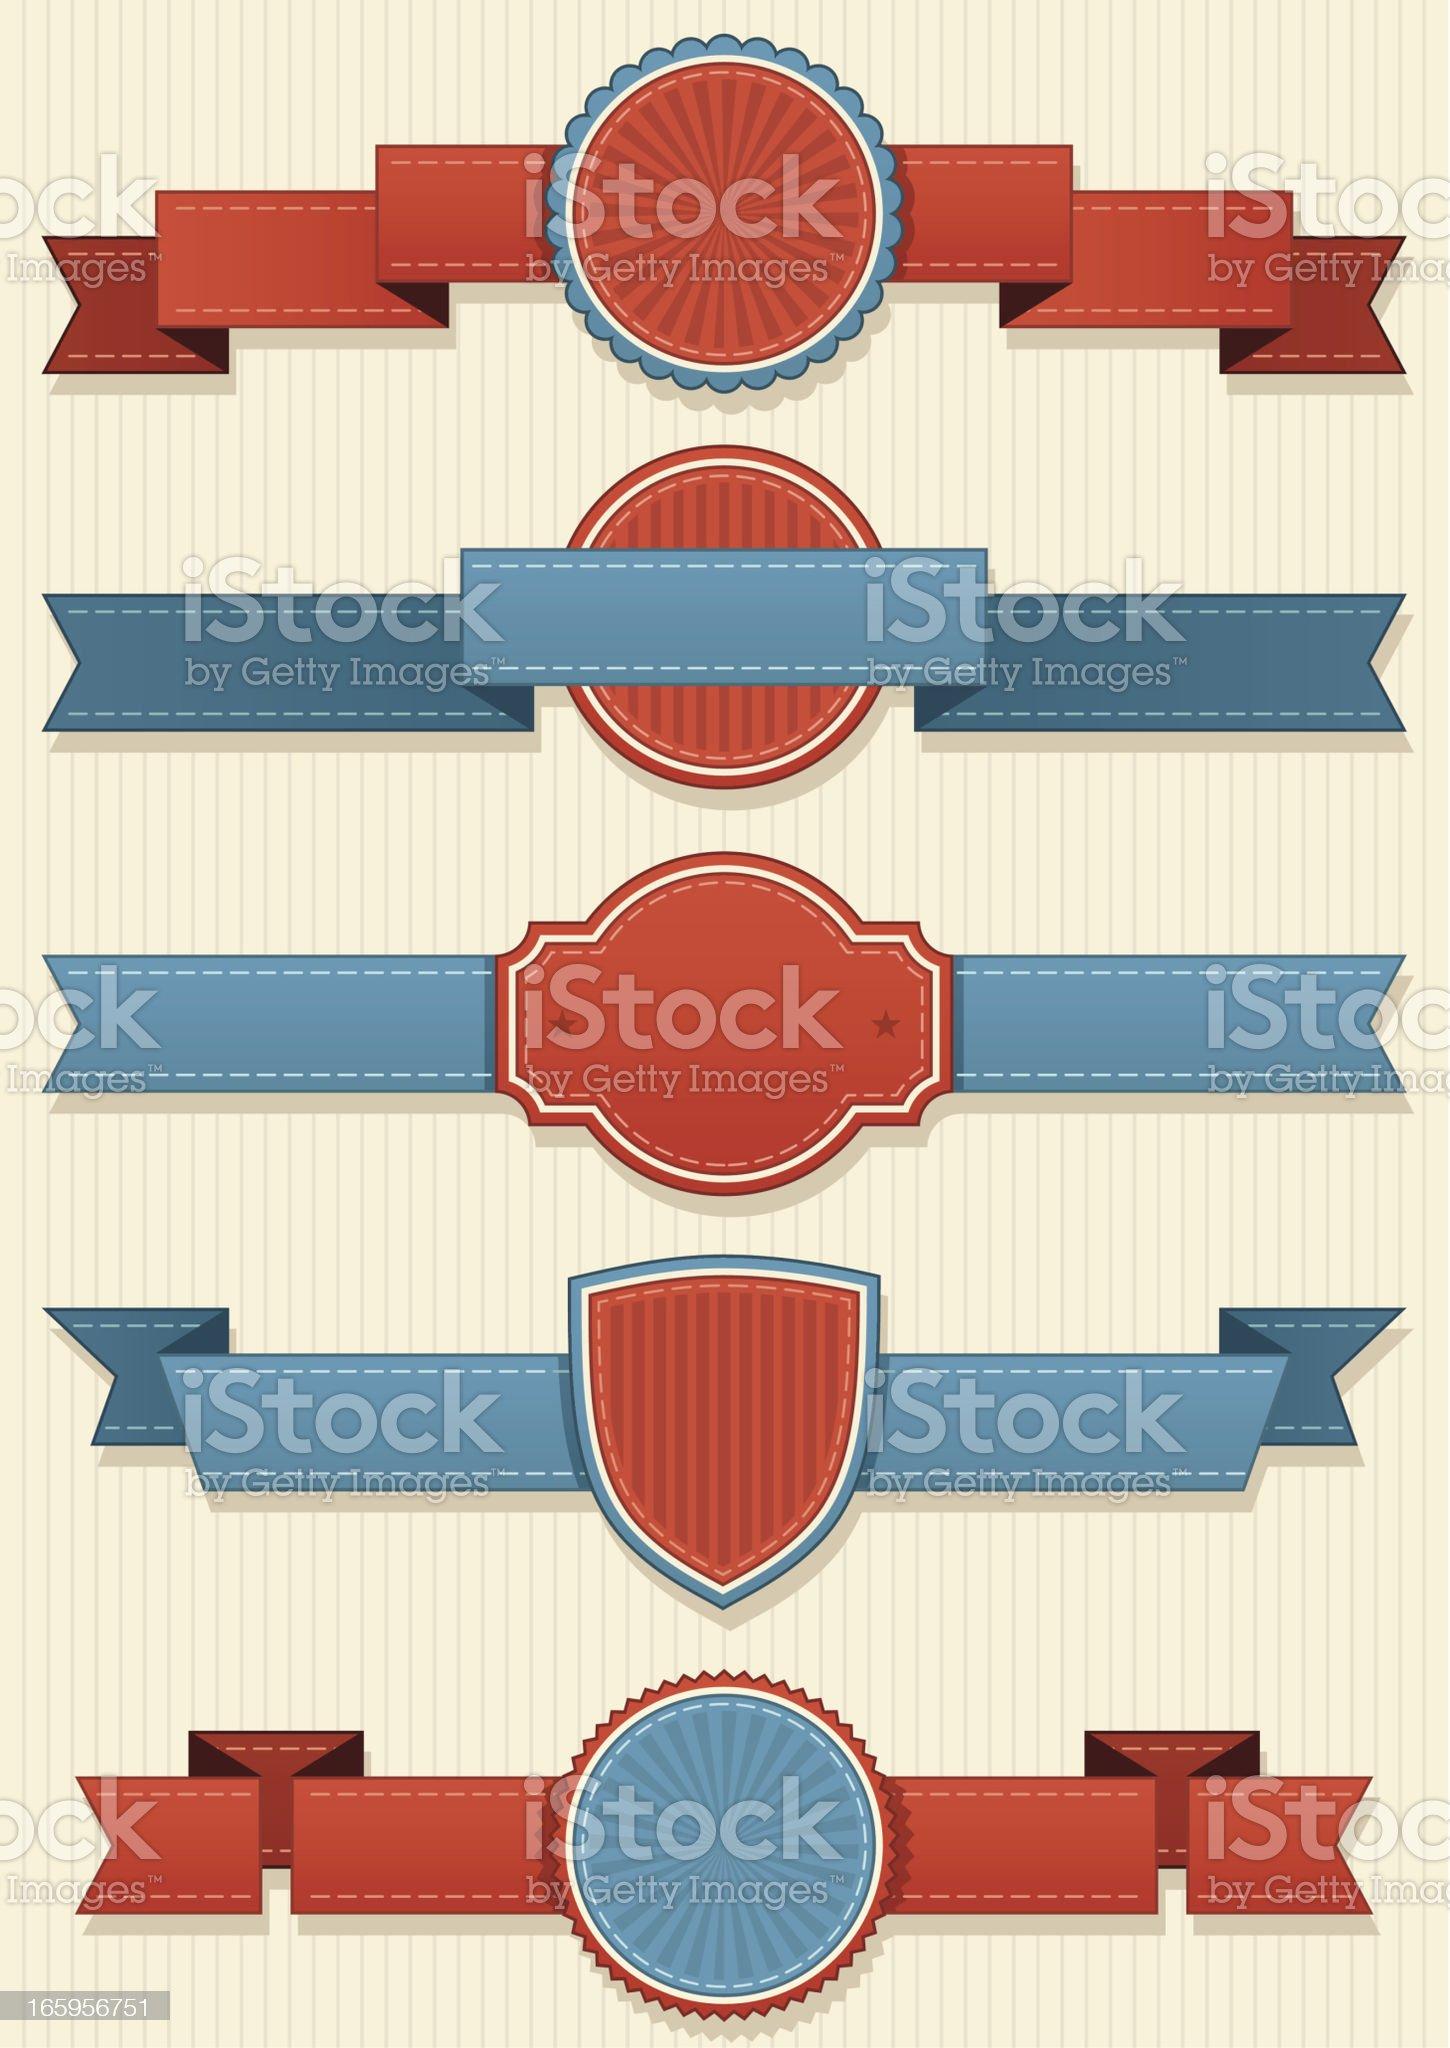 Set of retro ribbon elements and badges royalty-free stock vector art